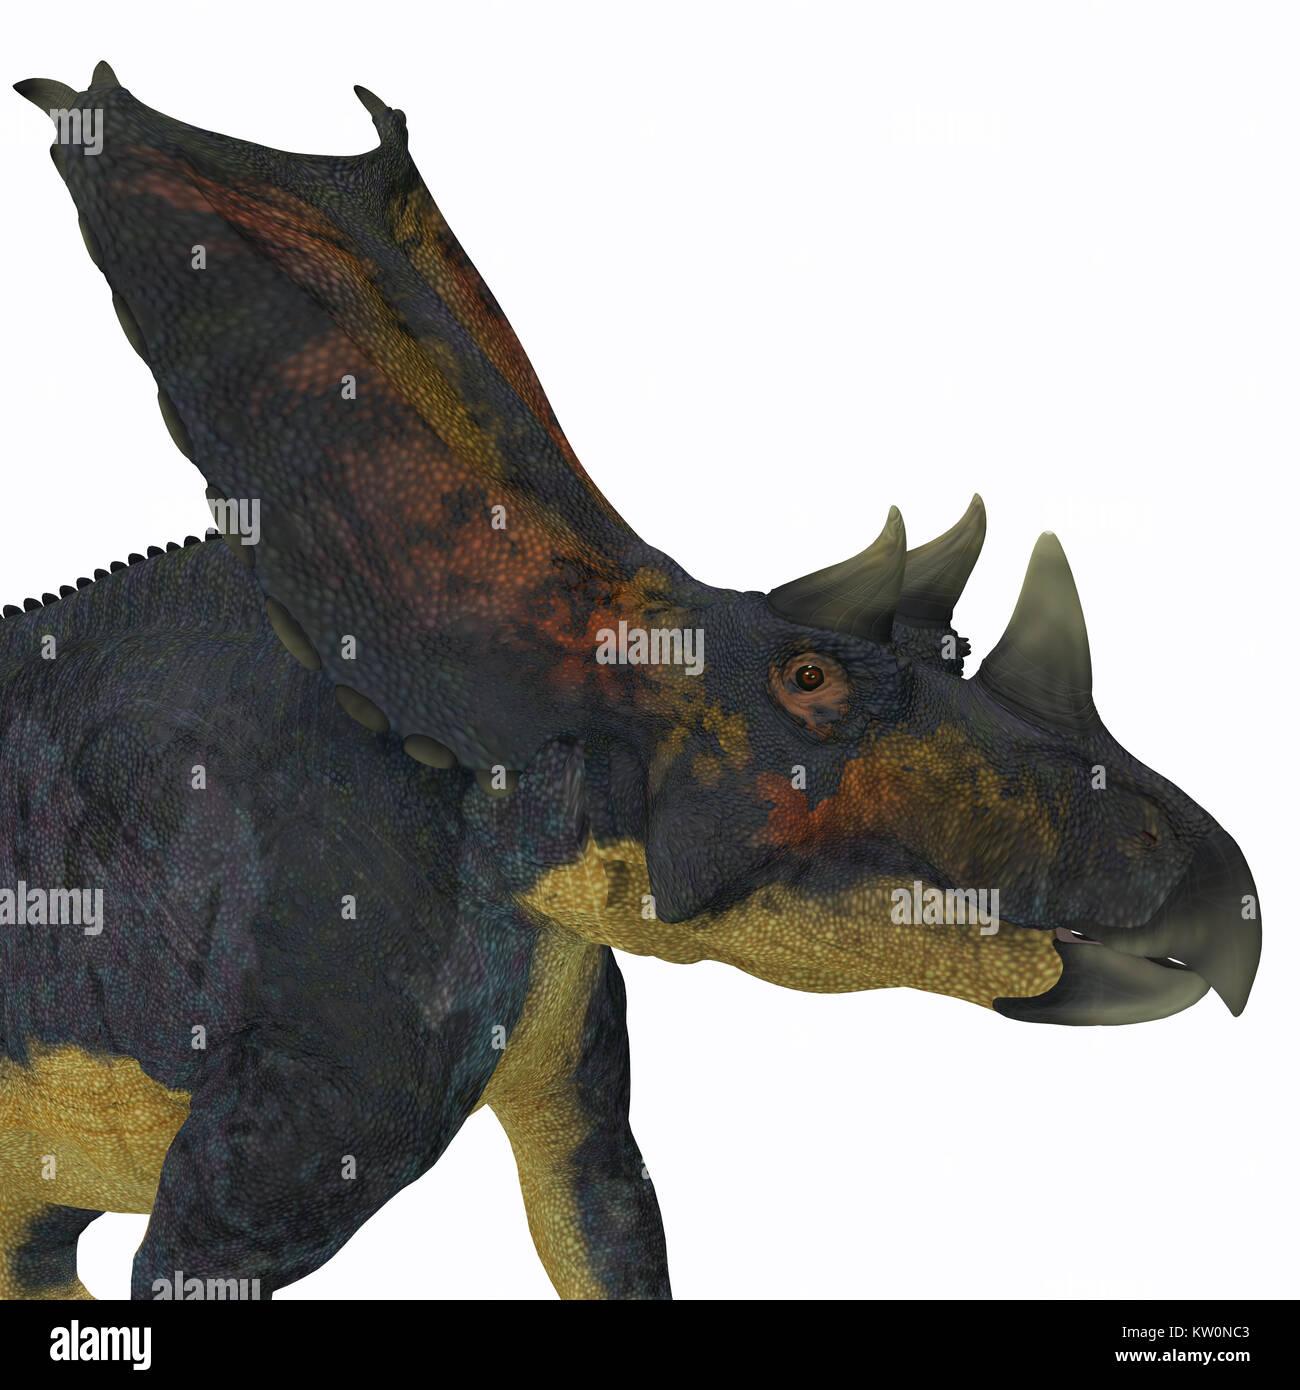 Chasmosaurus Dinosaur Head - Chasmosaurus was a herbivorous ceratopsian dinosaur that lived in Alberta, Canada during - Stock Image